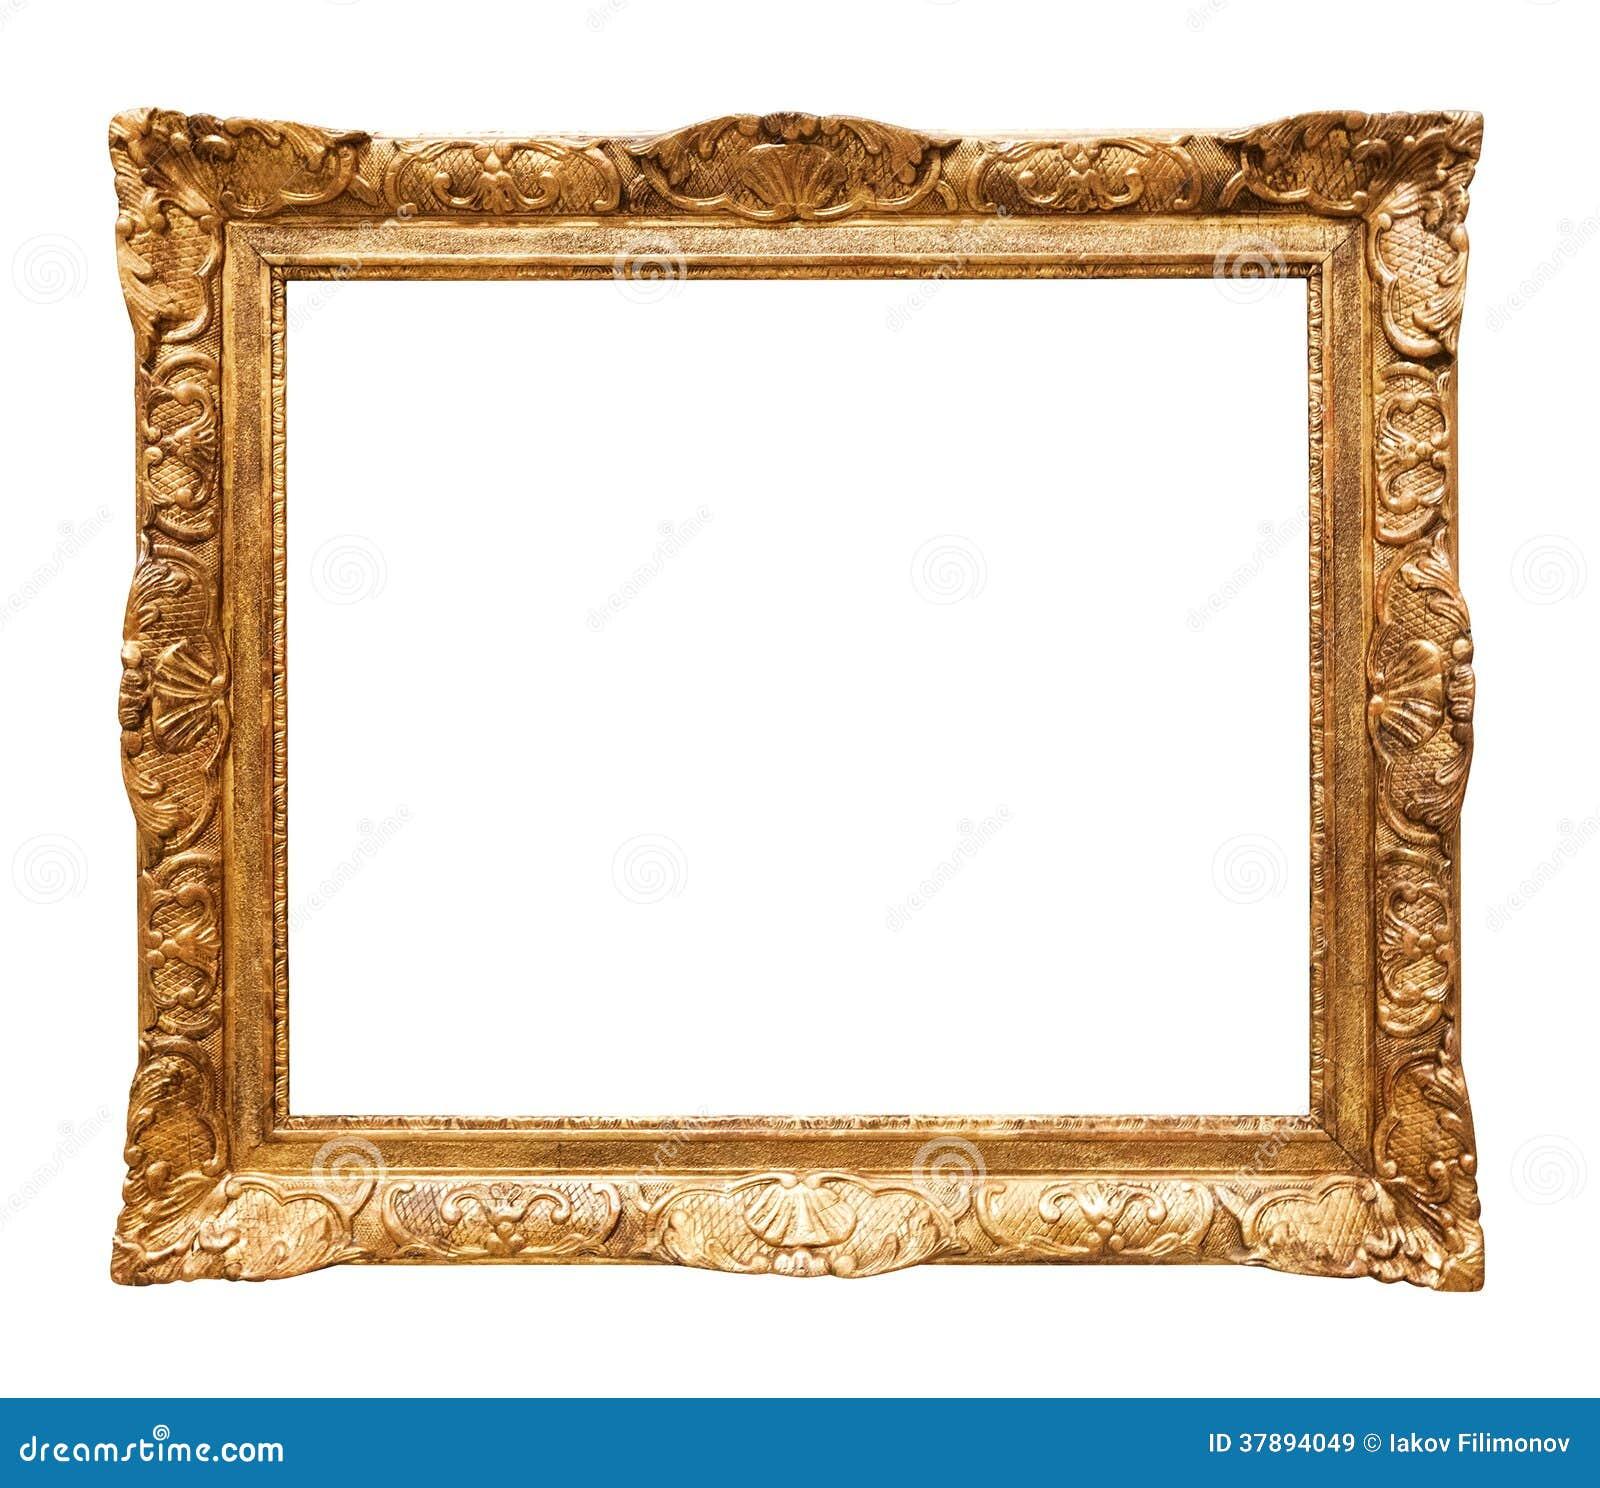 Marco dorado lujo del espejo